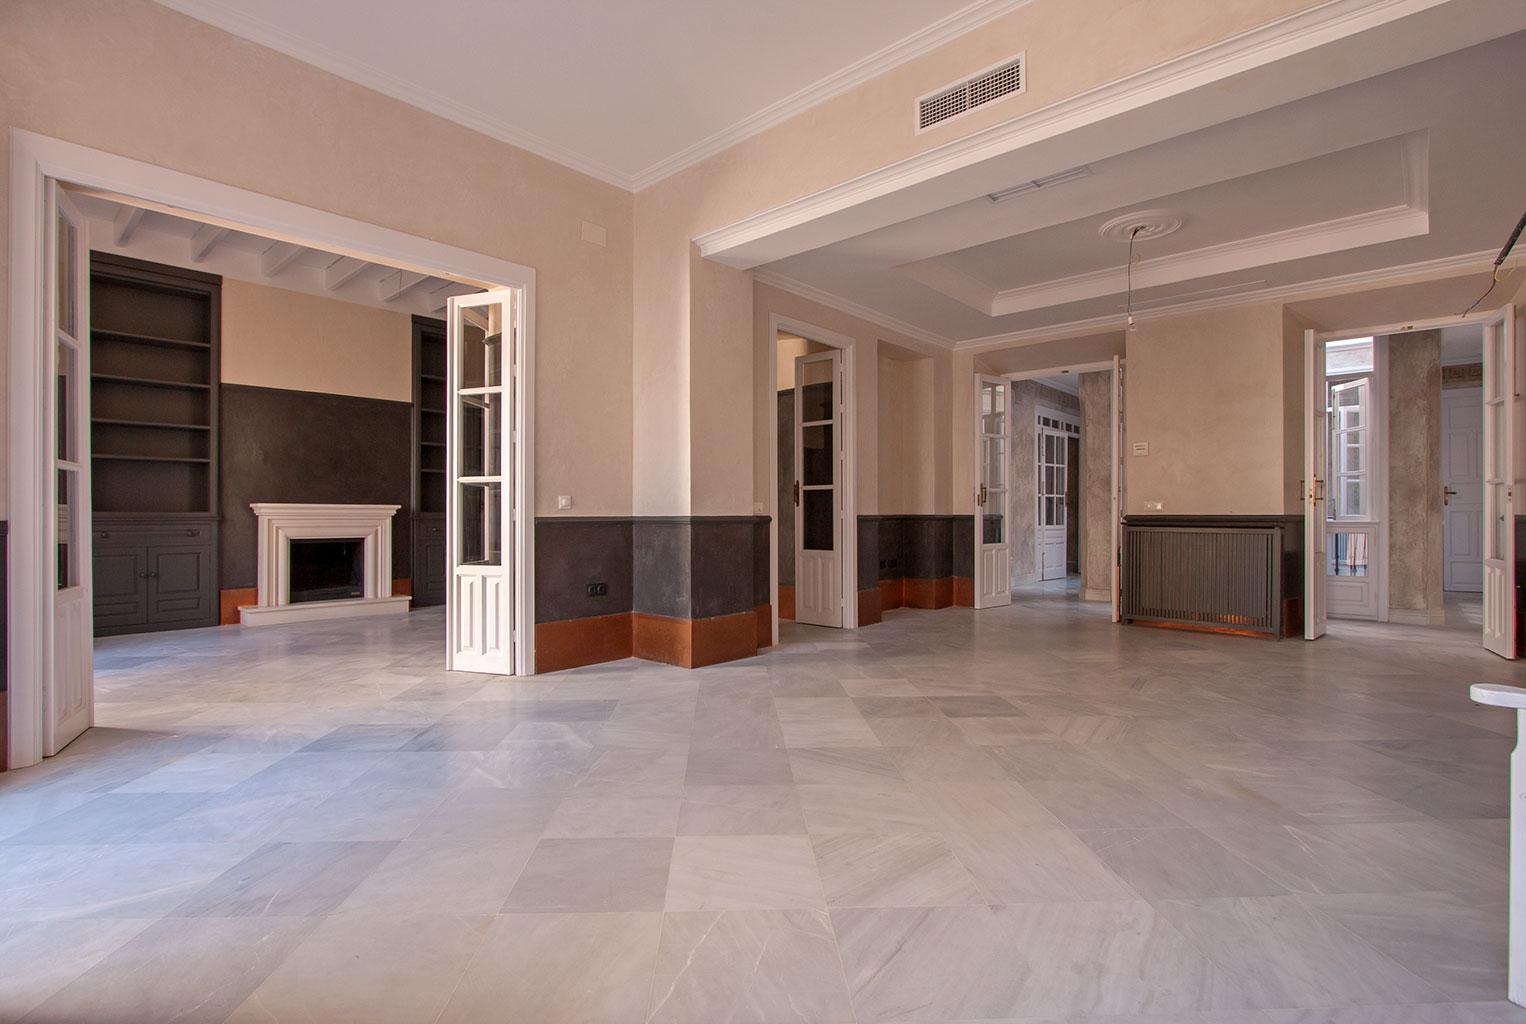 Vista angular del salón